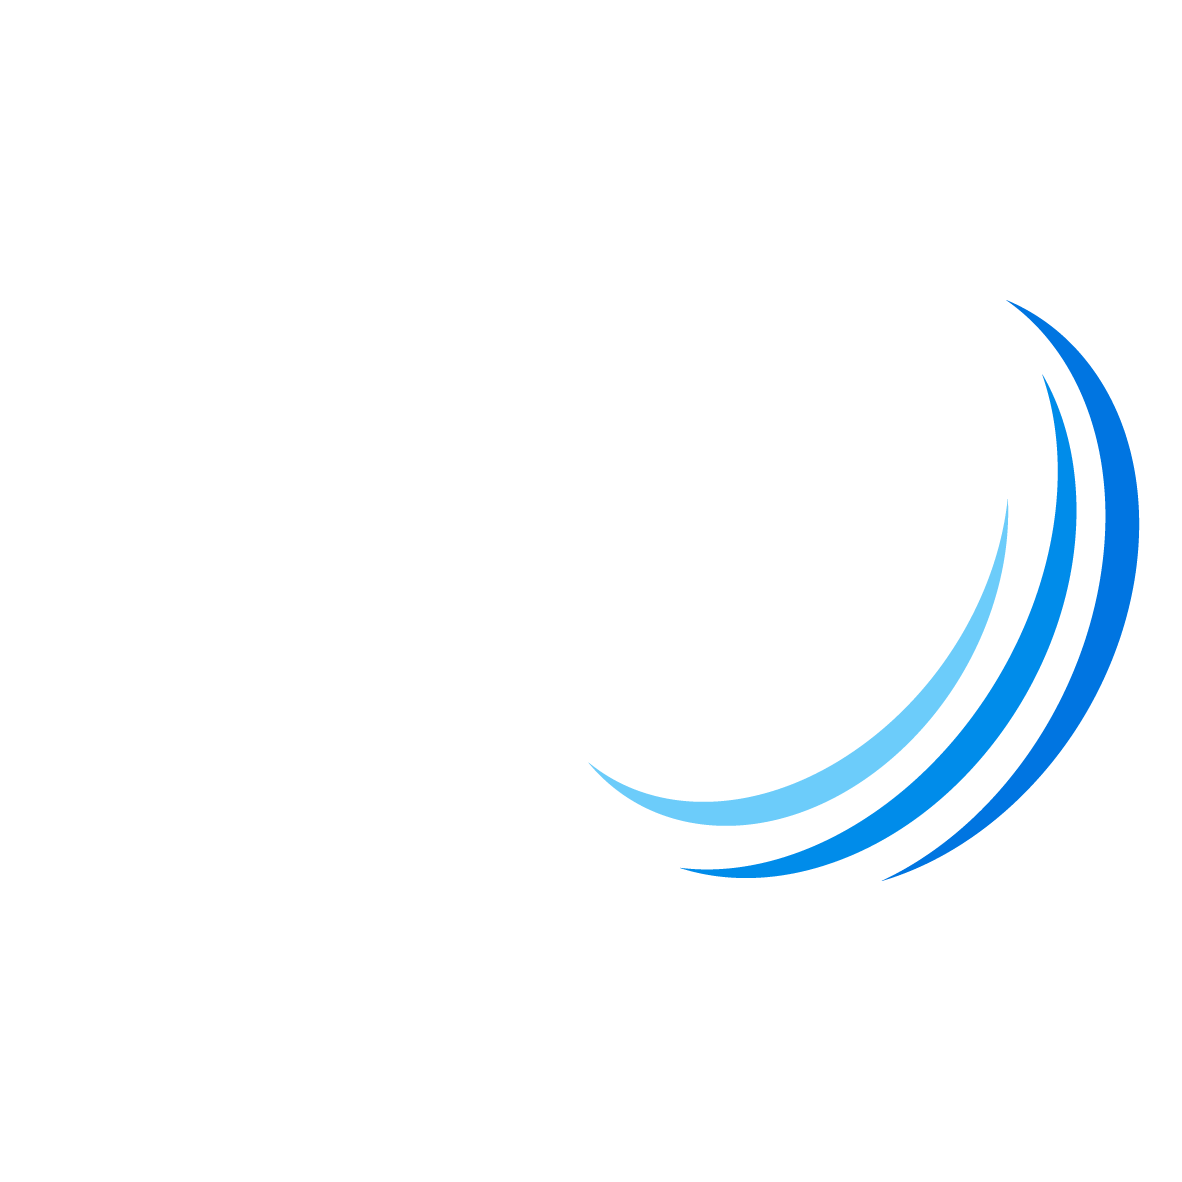 PT. Asia Global Suksesindo